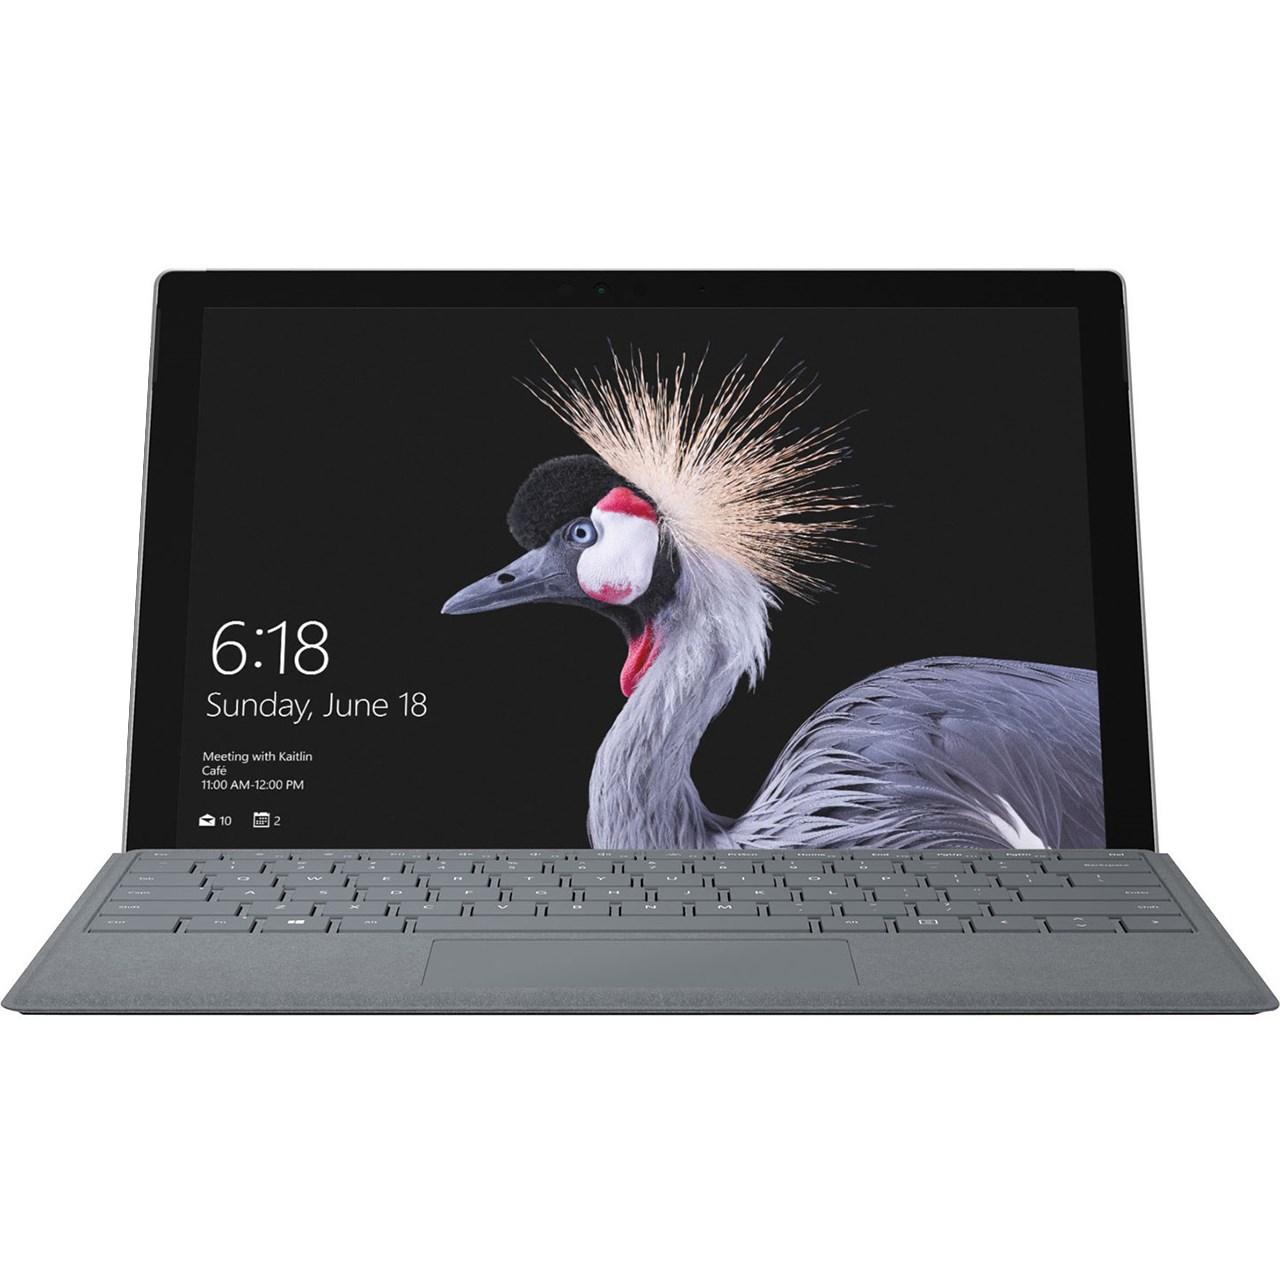 تبلت مایکروسافت مدل Surface Pro 2017 - E به همراه کیبورد سیگنیچر رنگ پلاتینیوم و کیف چرم صنوبر  - ظرفیت 512 گیگابایت